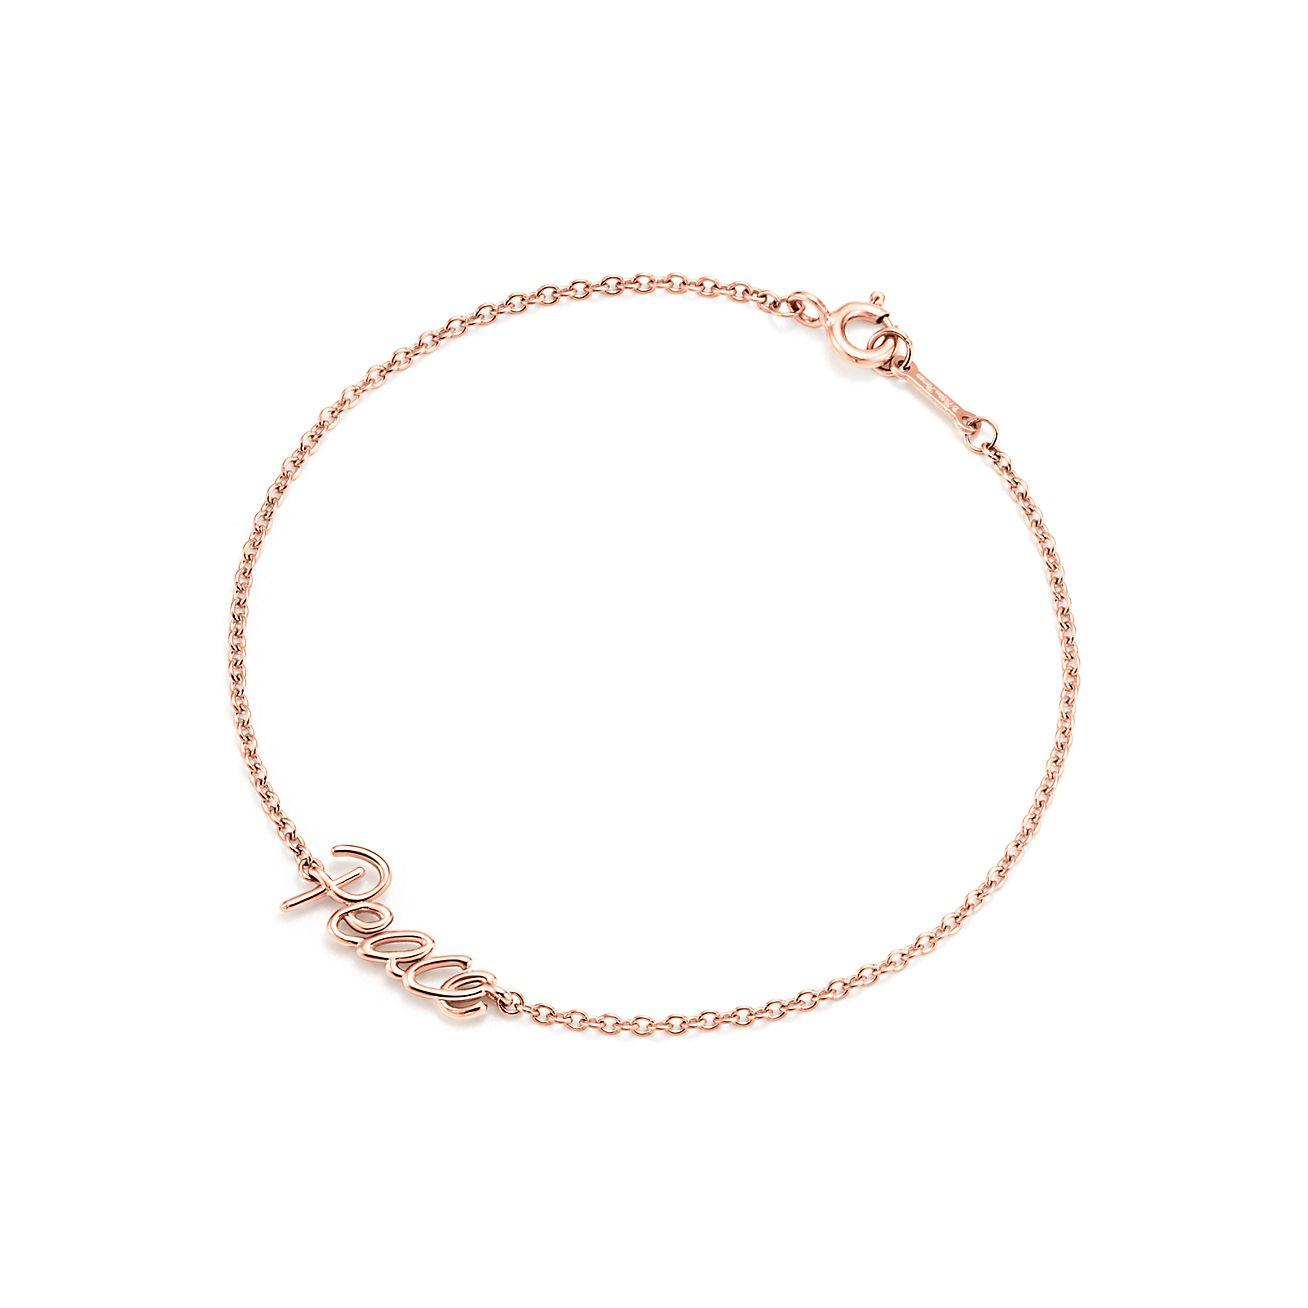 Palomas Graffiti love bracelet in 18k rose gold, large Tiffany & Co.